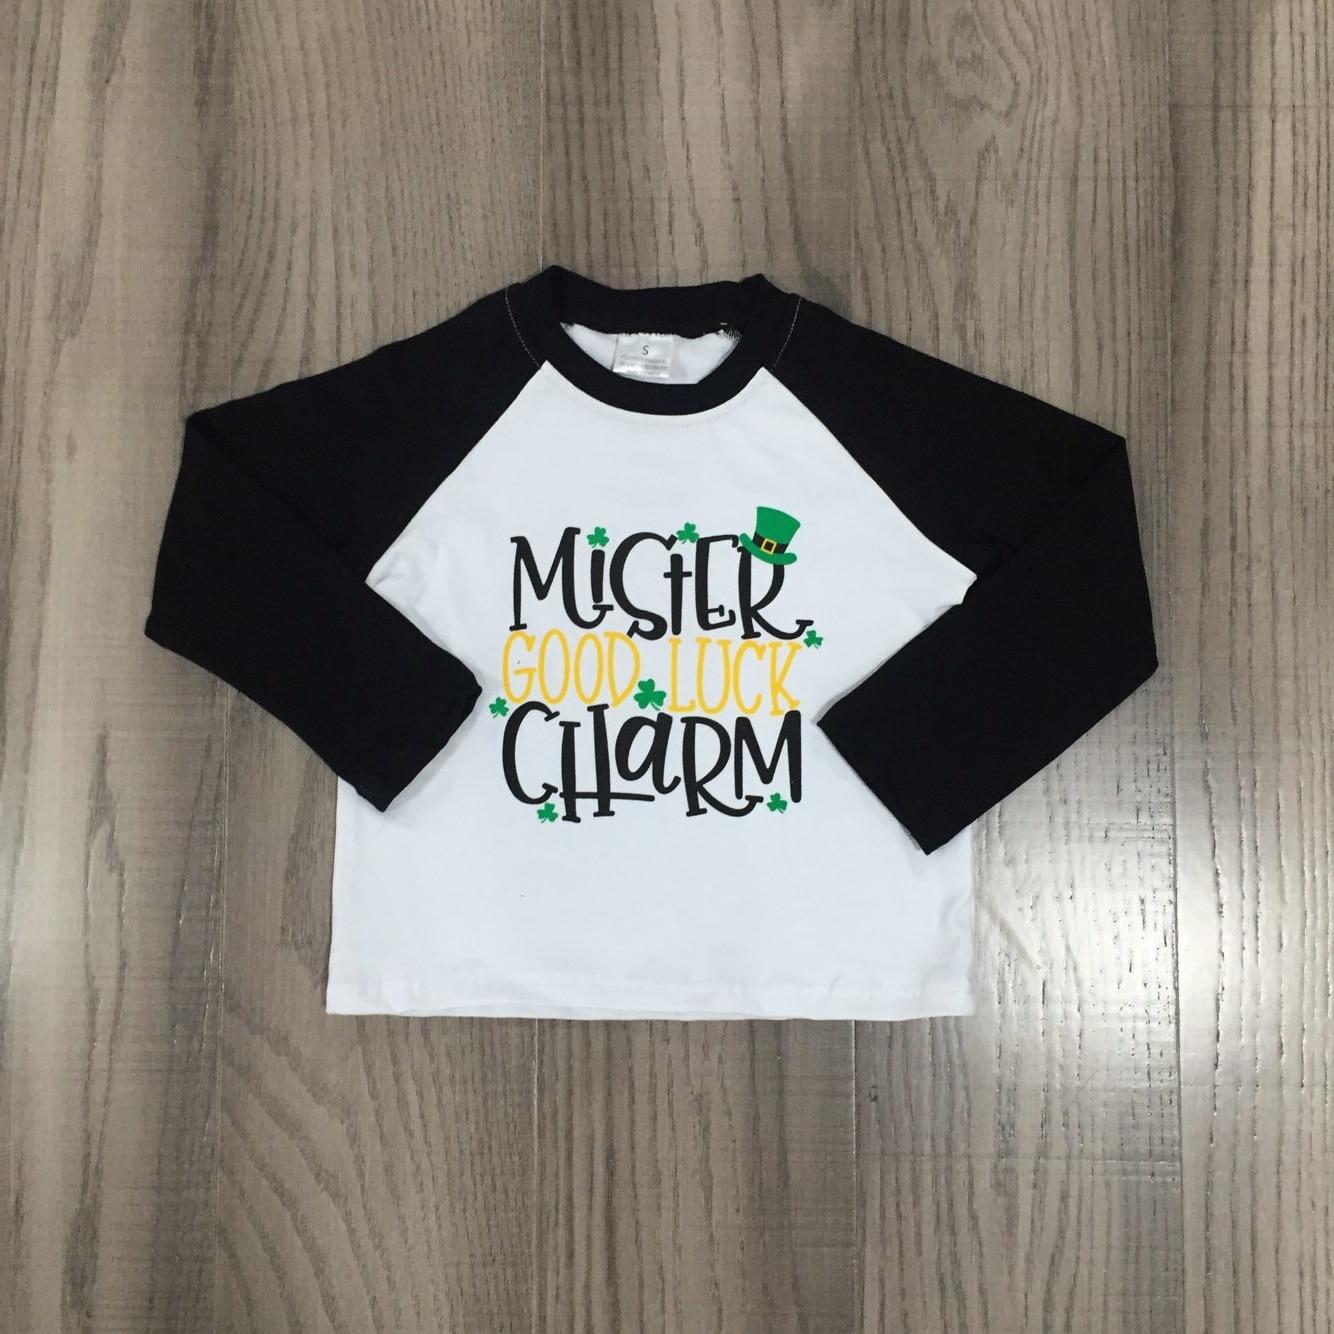 Girlymax Spring St Patrick Baby Boys Long Sleeve Cotton Boutique Top T-shirt Raglans Clothes Lucky Shark Shamrocks Clover 4